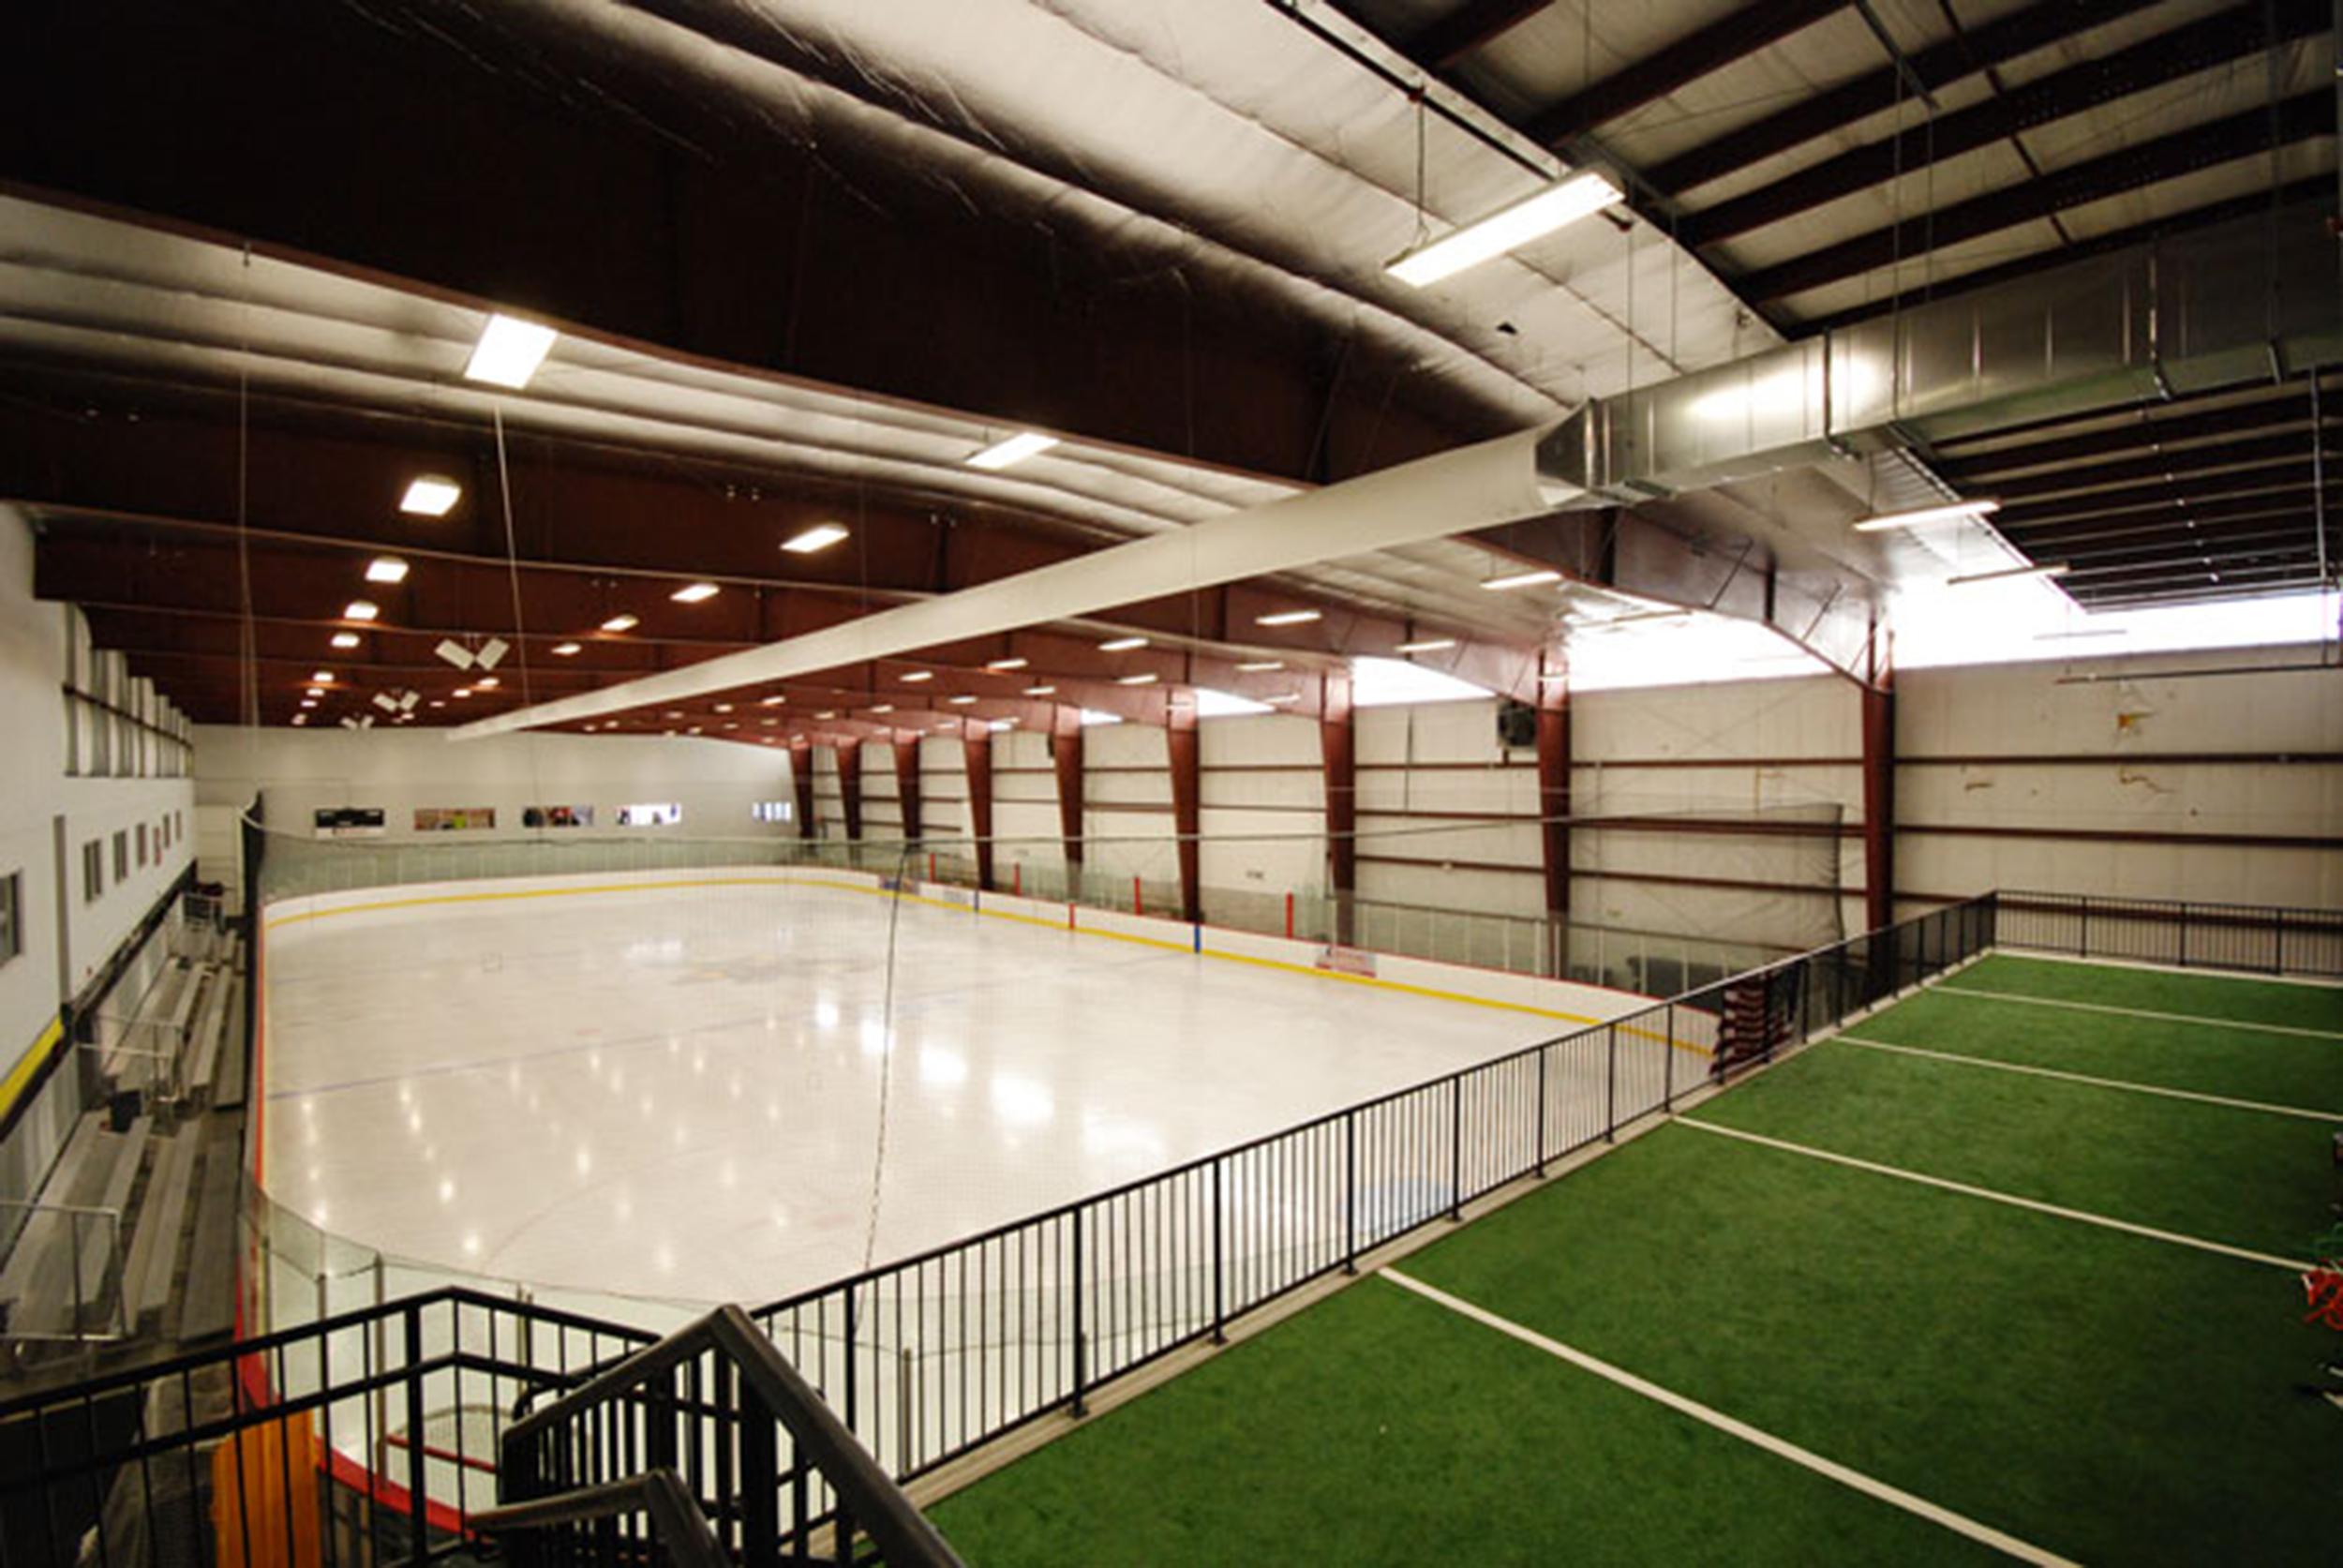 Edge Sports Center